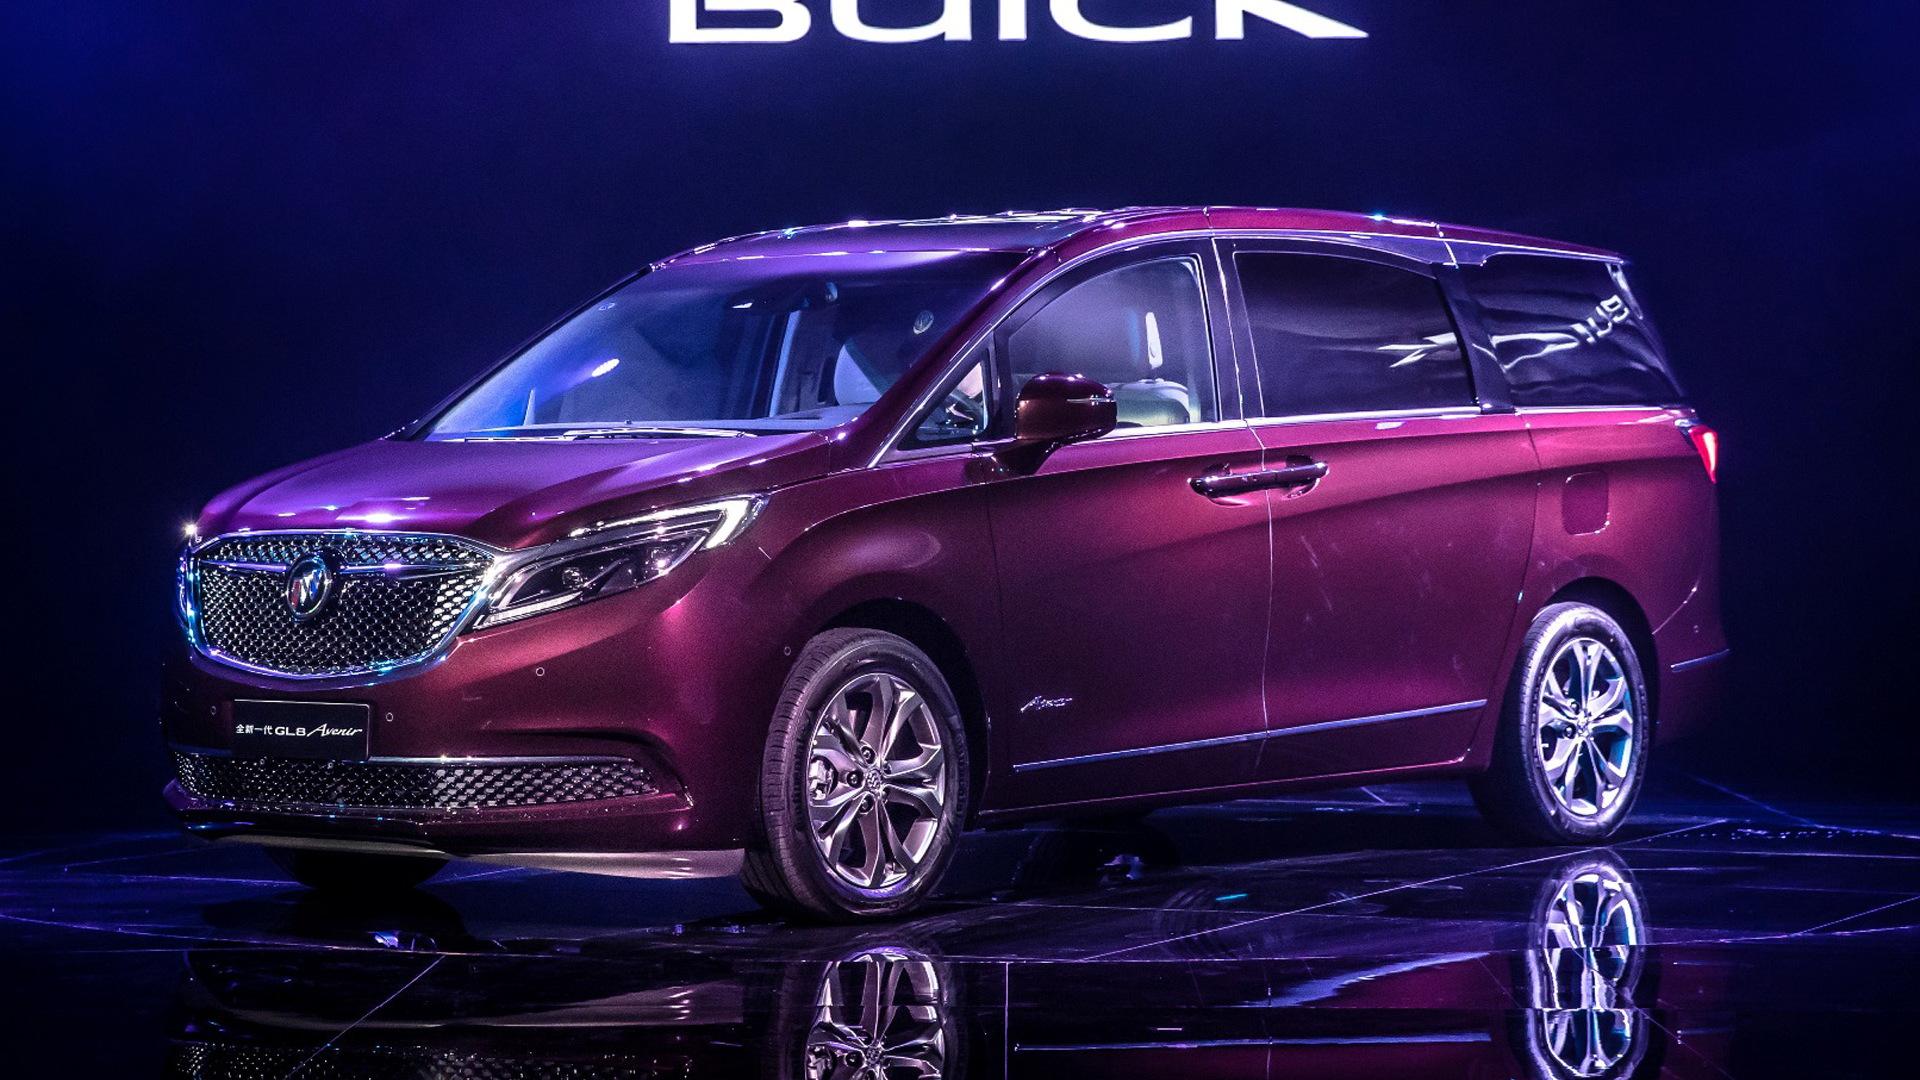 2017 Buick GL8 Avenir (Chinese spec)